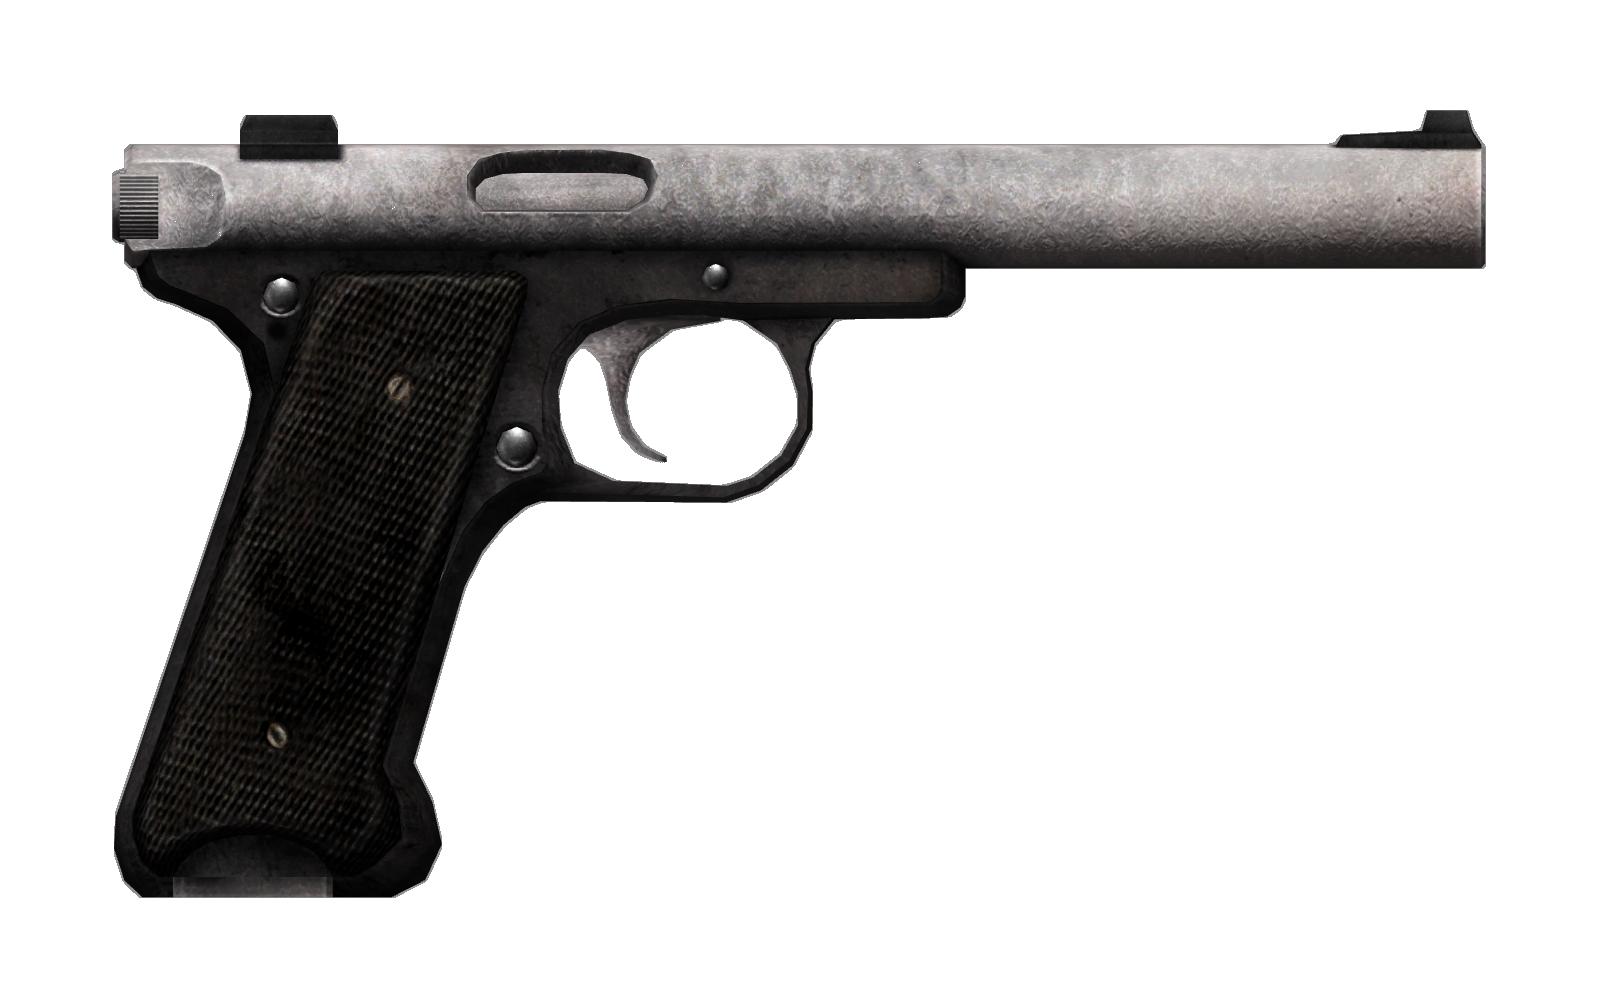 Pistol clipart police gun. Common sense laws we